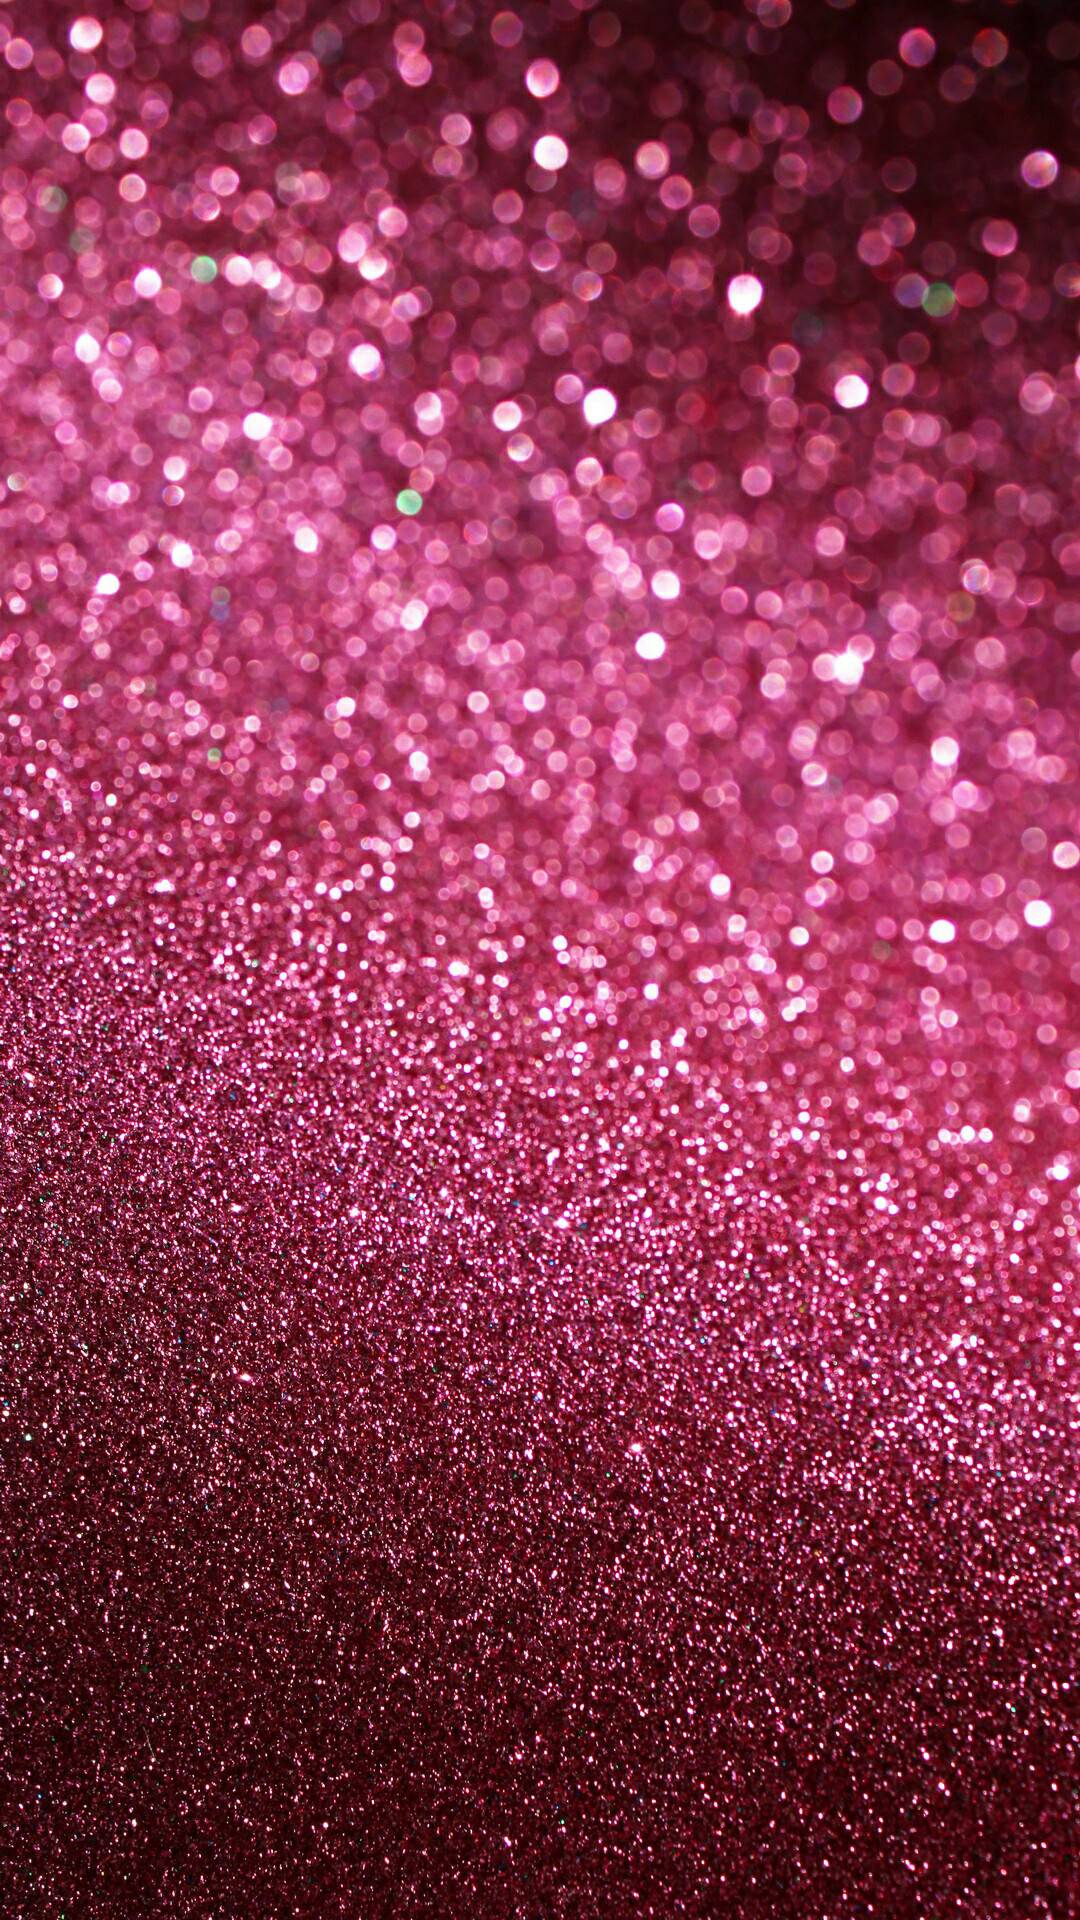 Glitter Wallpapers S11 Note 11 67 Pink Wallpaper 4k Iphone 1080x1920 Download Hd Wallpaper Wallpapertip